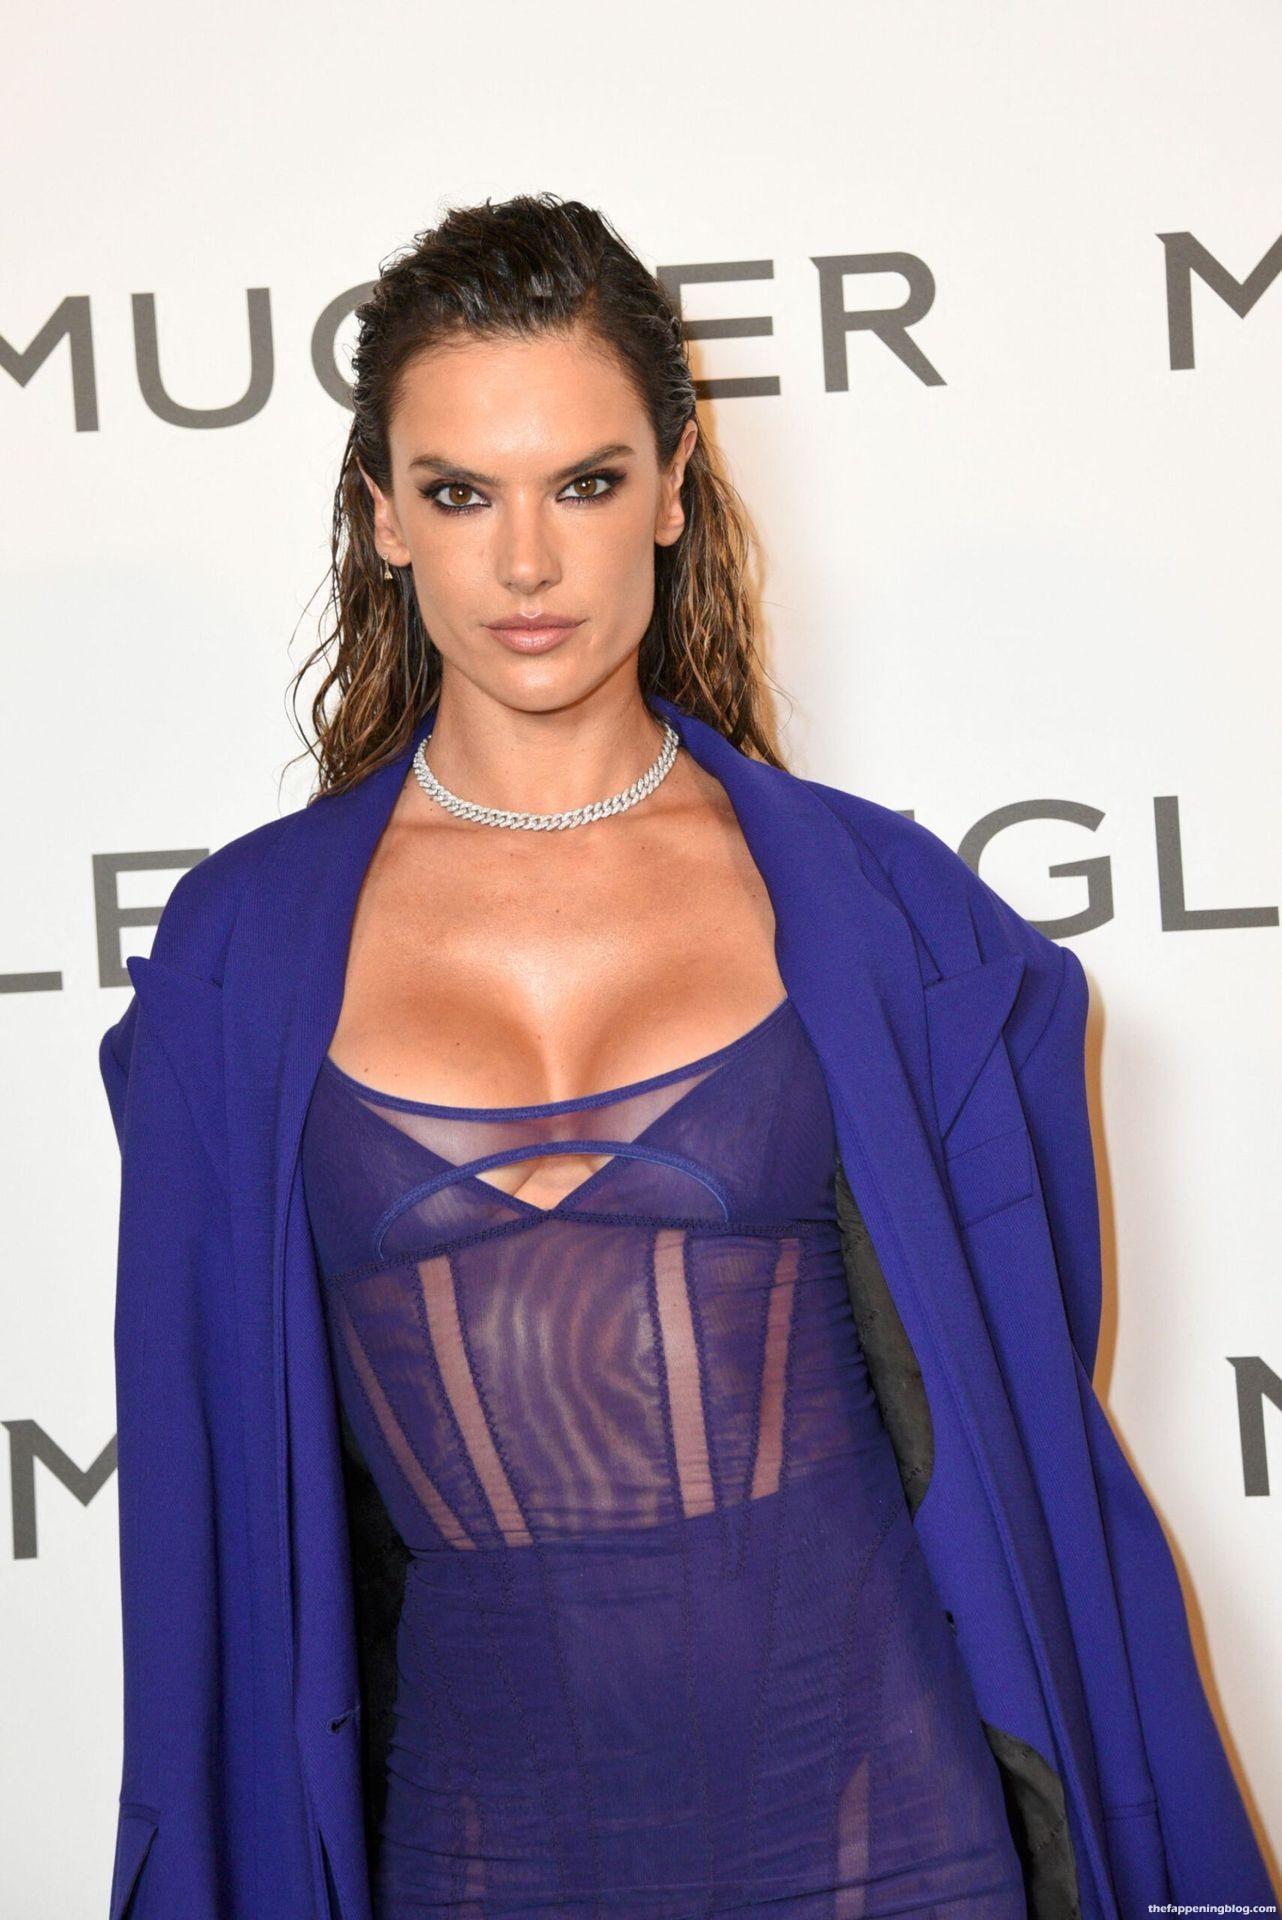 Alessandra-Ambrosio-Sexy-The-Fappening-Blog-13-4.jpg